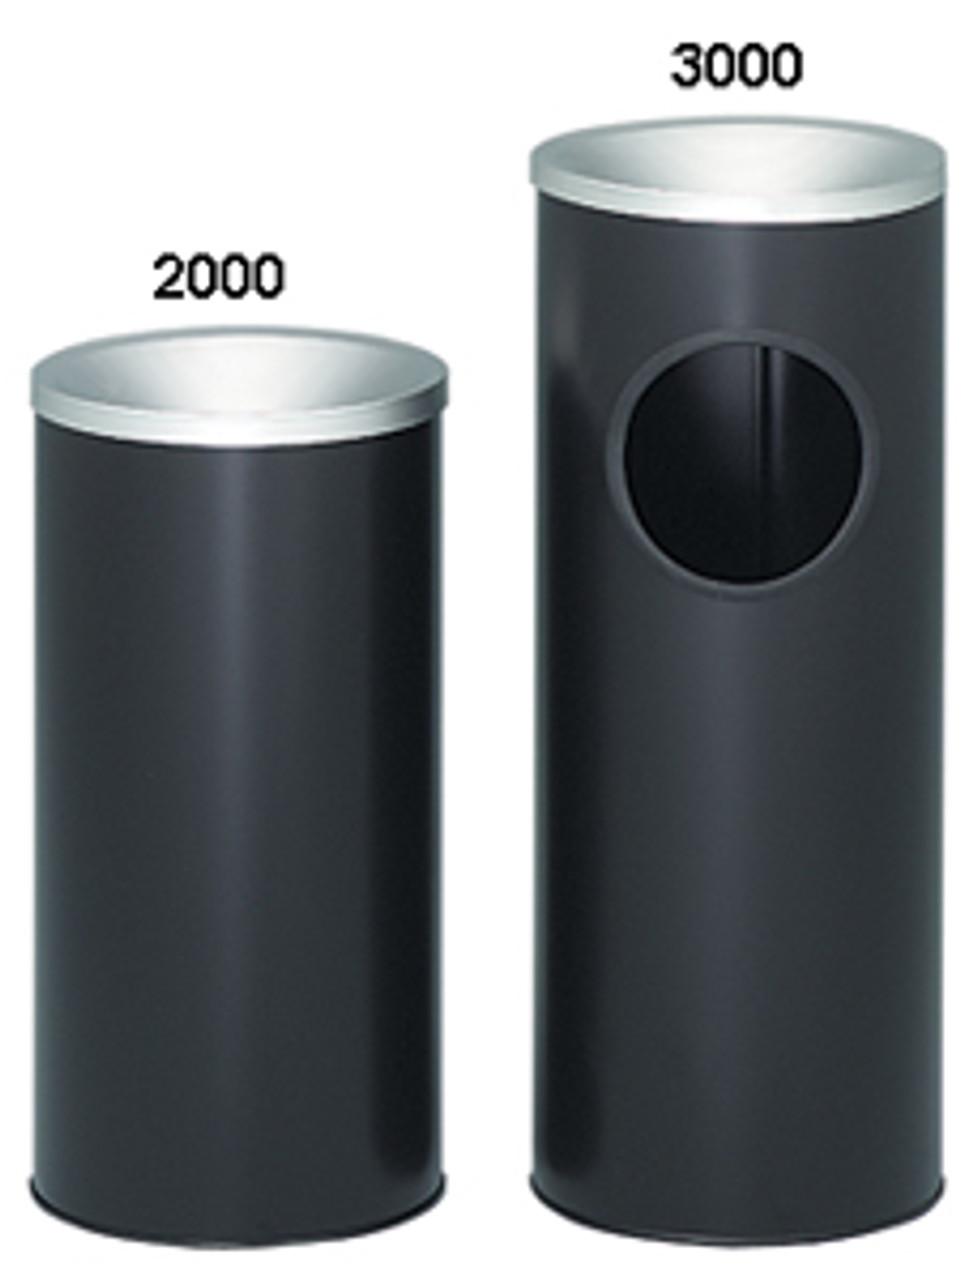 Metal Sand Top Ashtray or Ash Trash Floor Urn 2000/3000